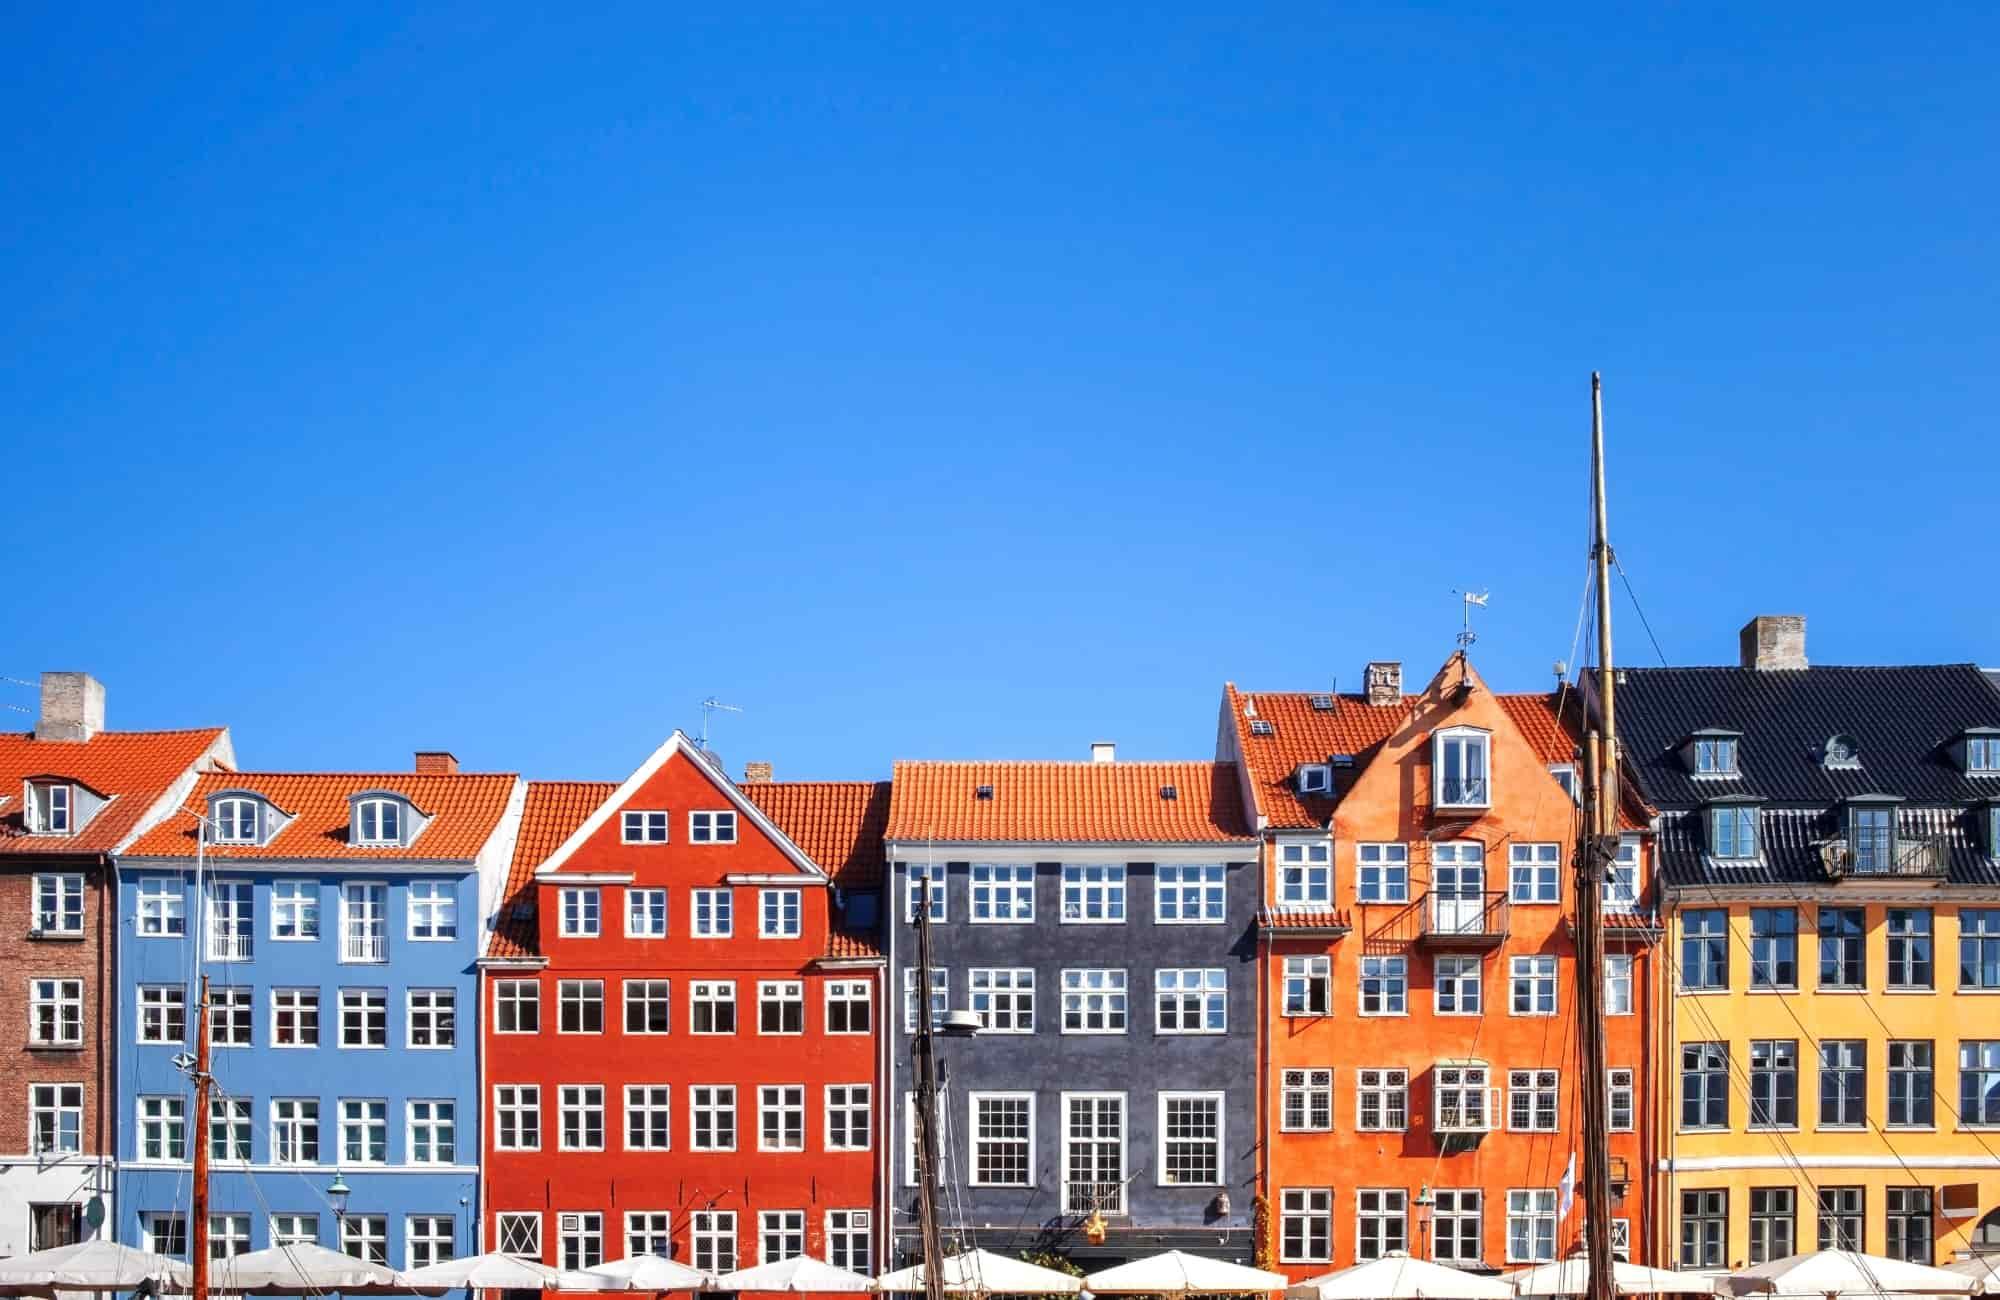 Voyage Danemark - Copenhague - Amplitudes